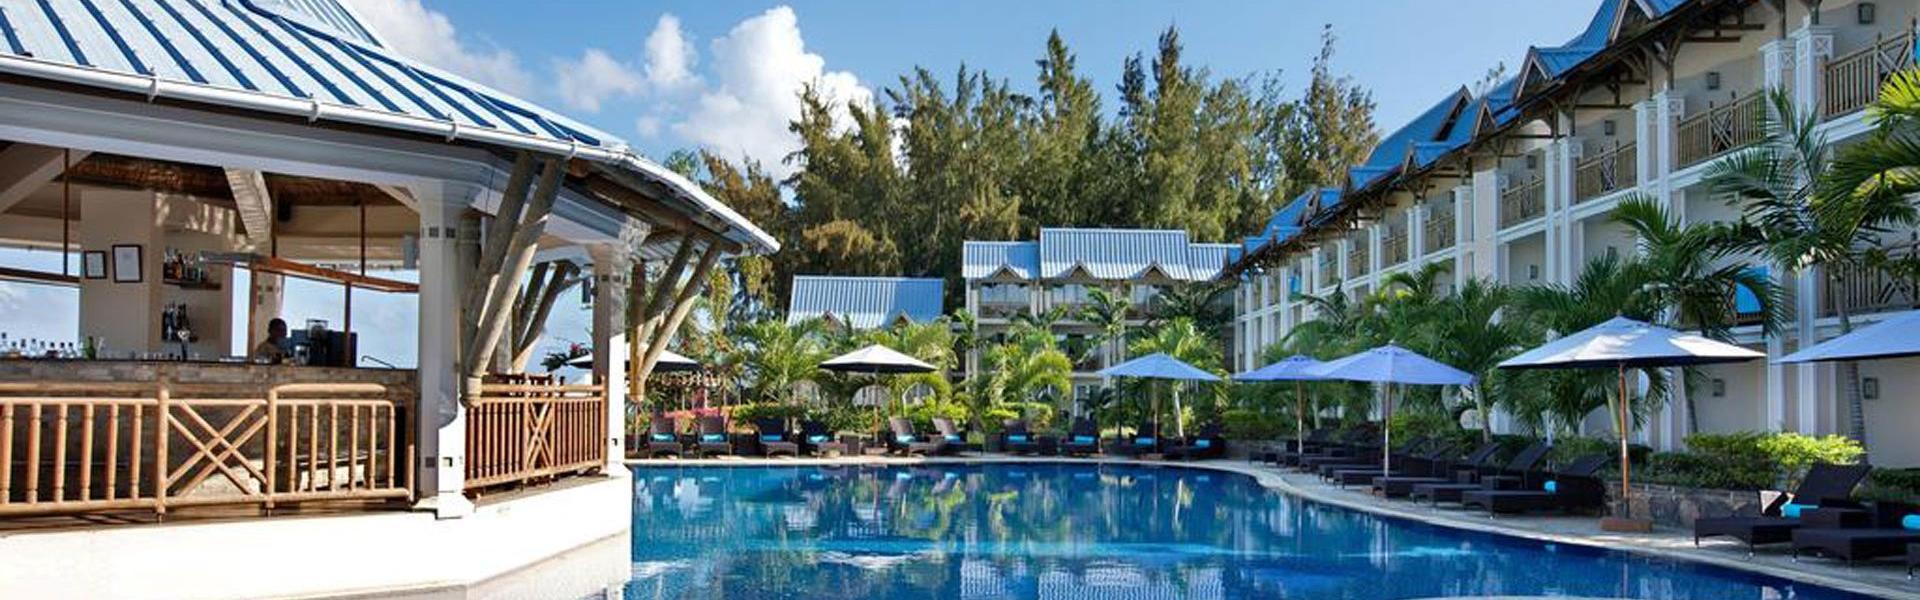 Pearle Beach Resort & Spa (Mauritiusi utazások)